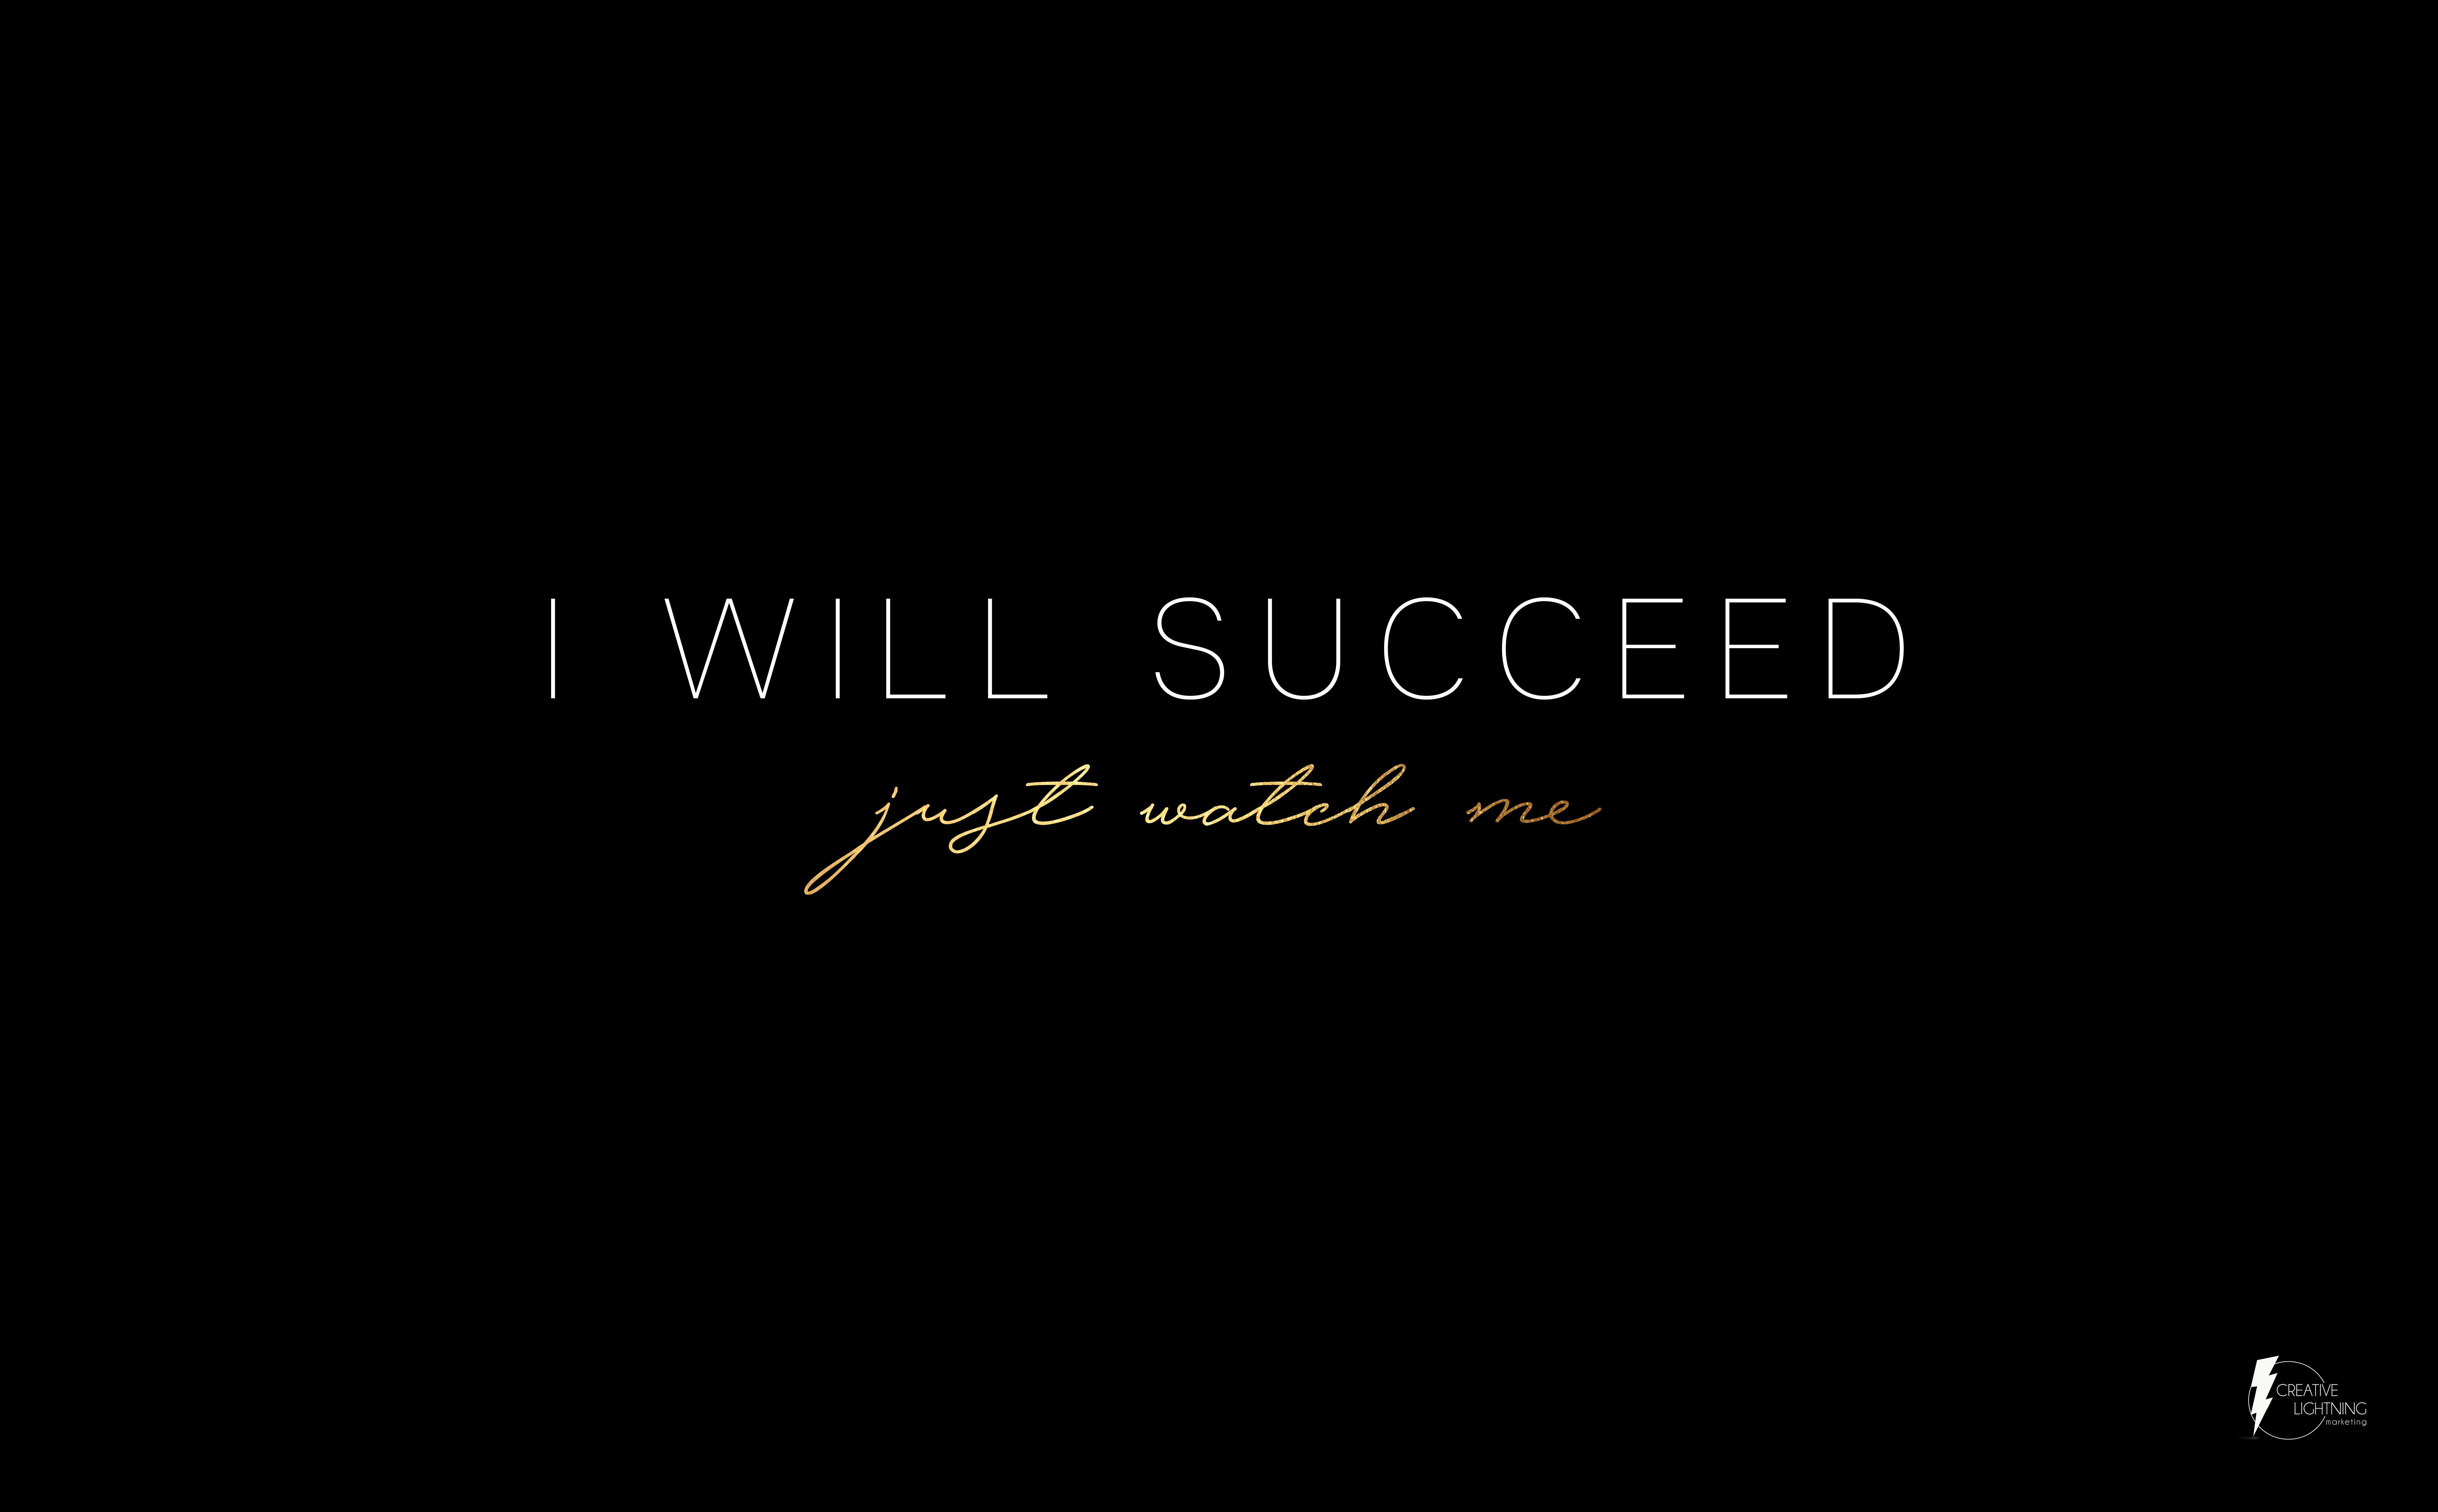 I Will Succeed Motivational Desktop Wallpaper Designed By Creativelightningmarketing Inspirational Quotes Wallpapers I Will Succeed Inspirational Quotes